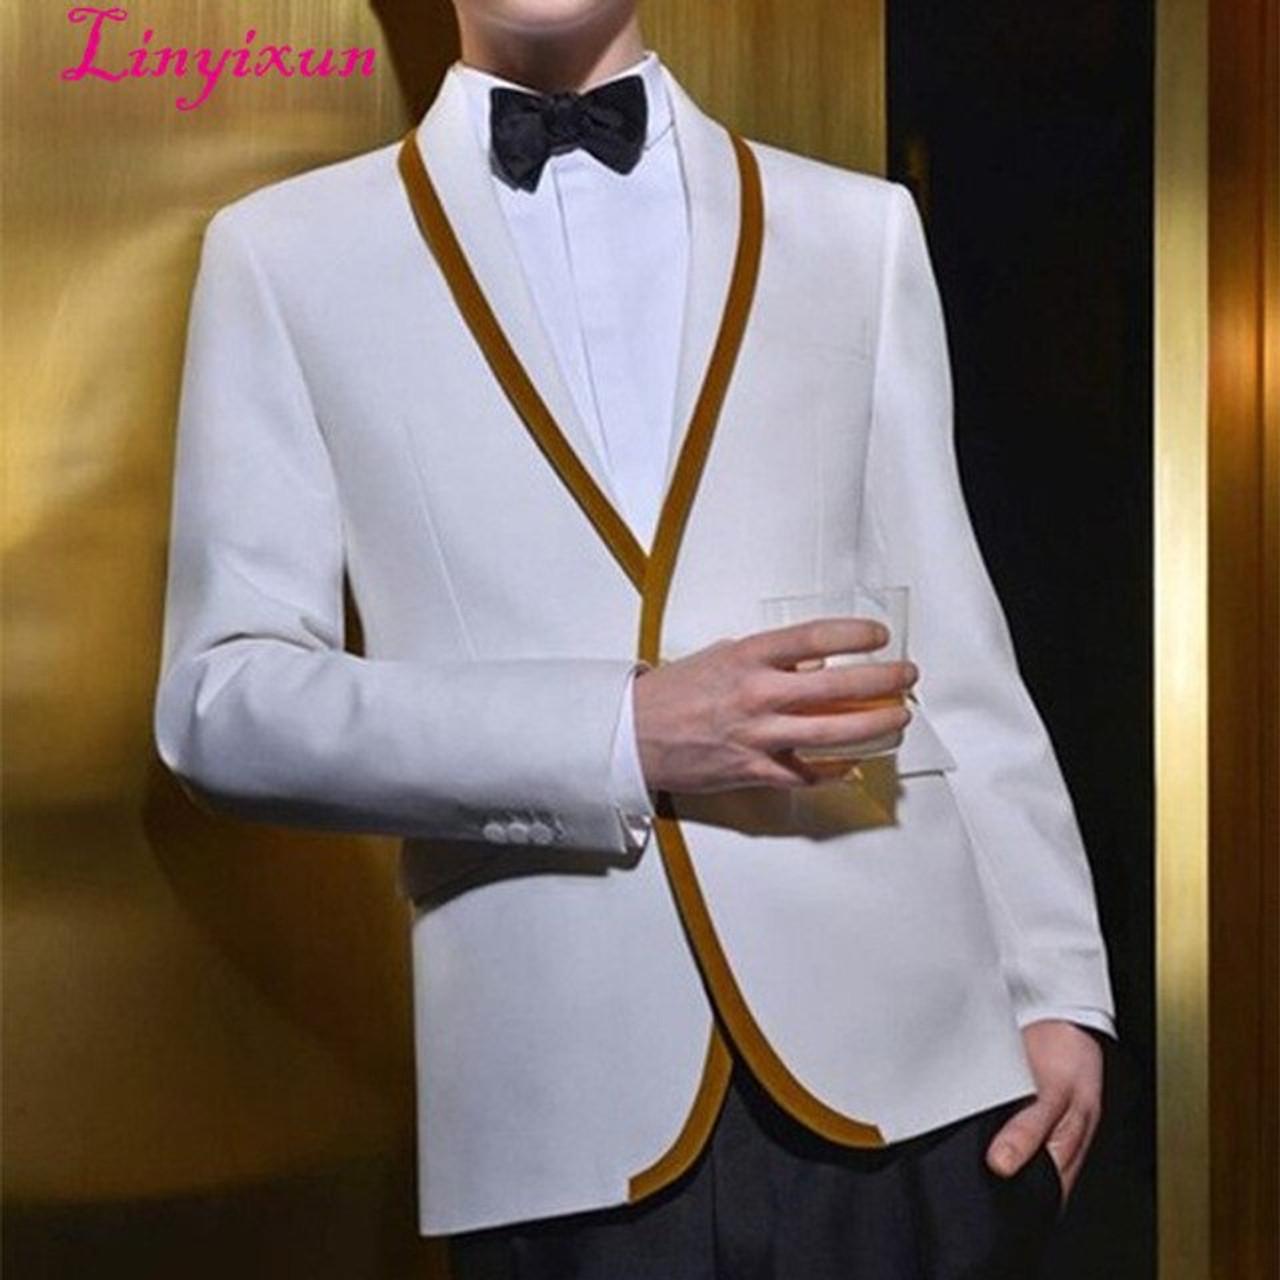 clearance retro noveldesign Linyixun Latest Coat Pant Designs White Gold Trim Tuxedo jacket Prom Men  Suit Slim Fit Custom 2 Piece Suits Groom Blazers Terno